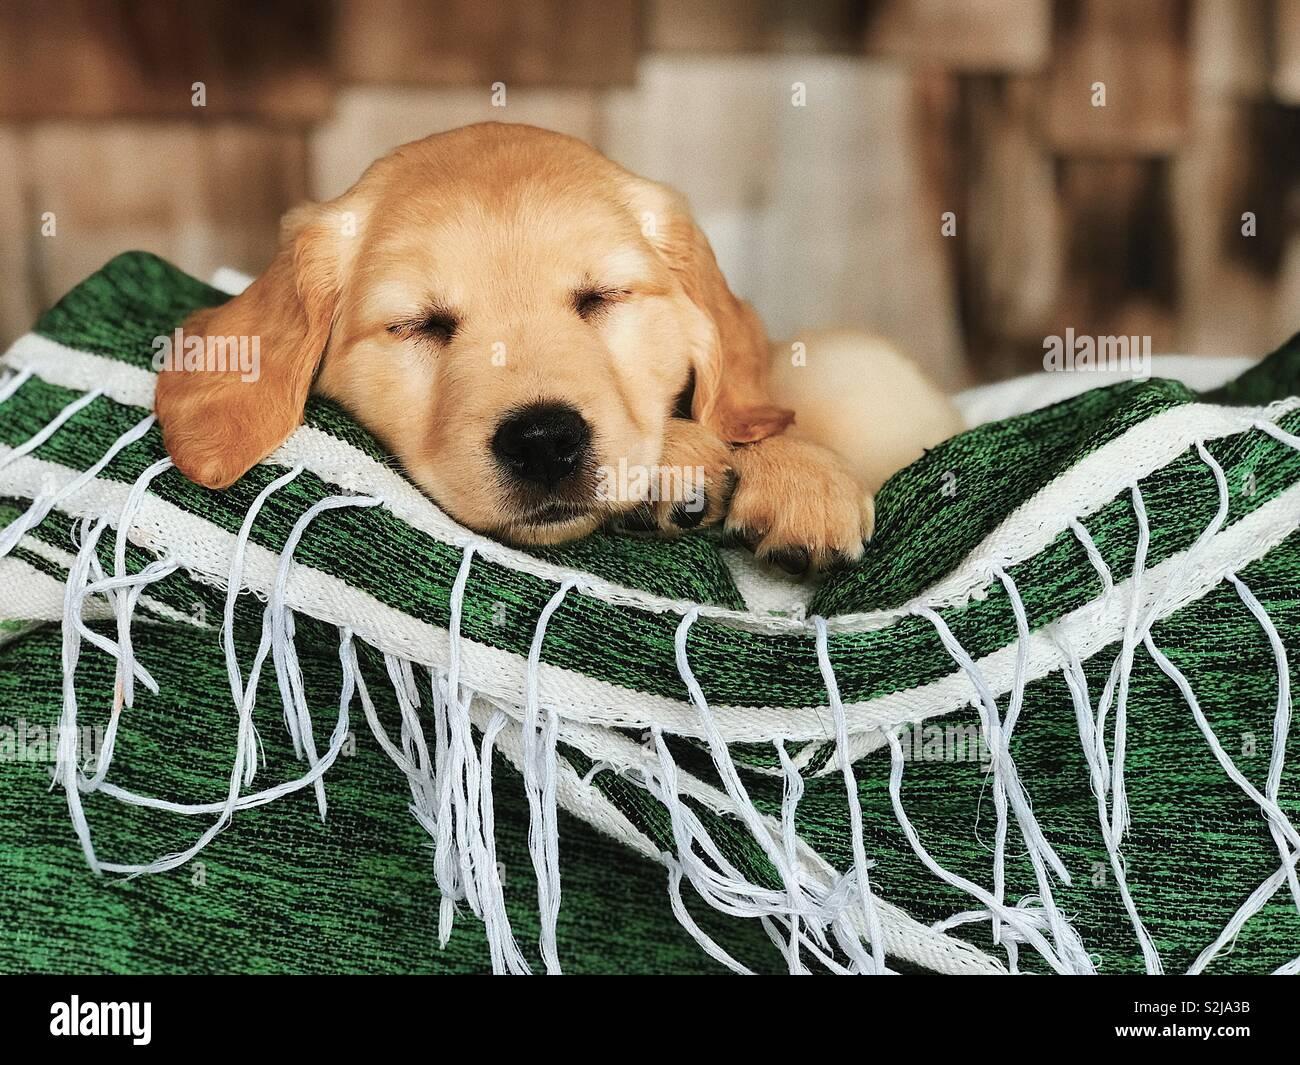 Chiot mignon dormir Banque D'Images